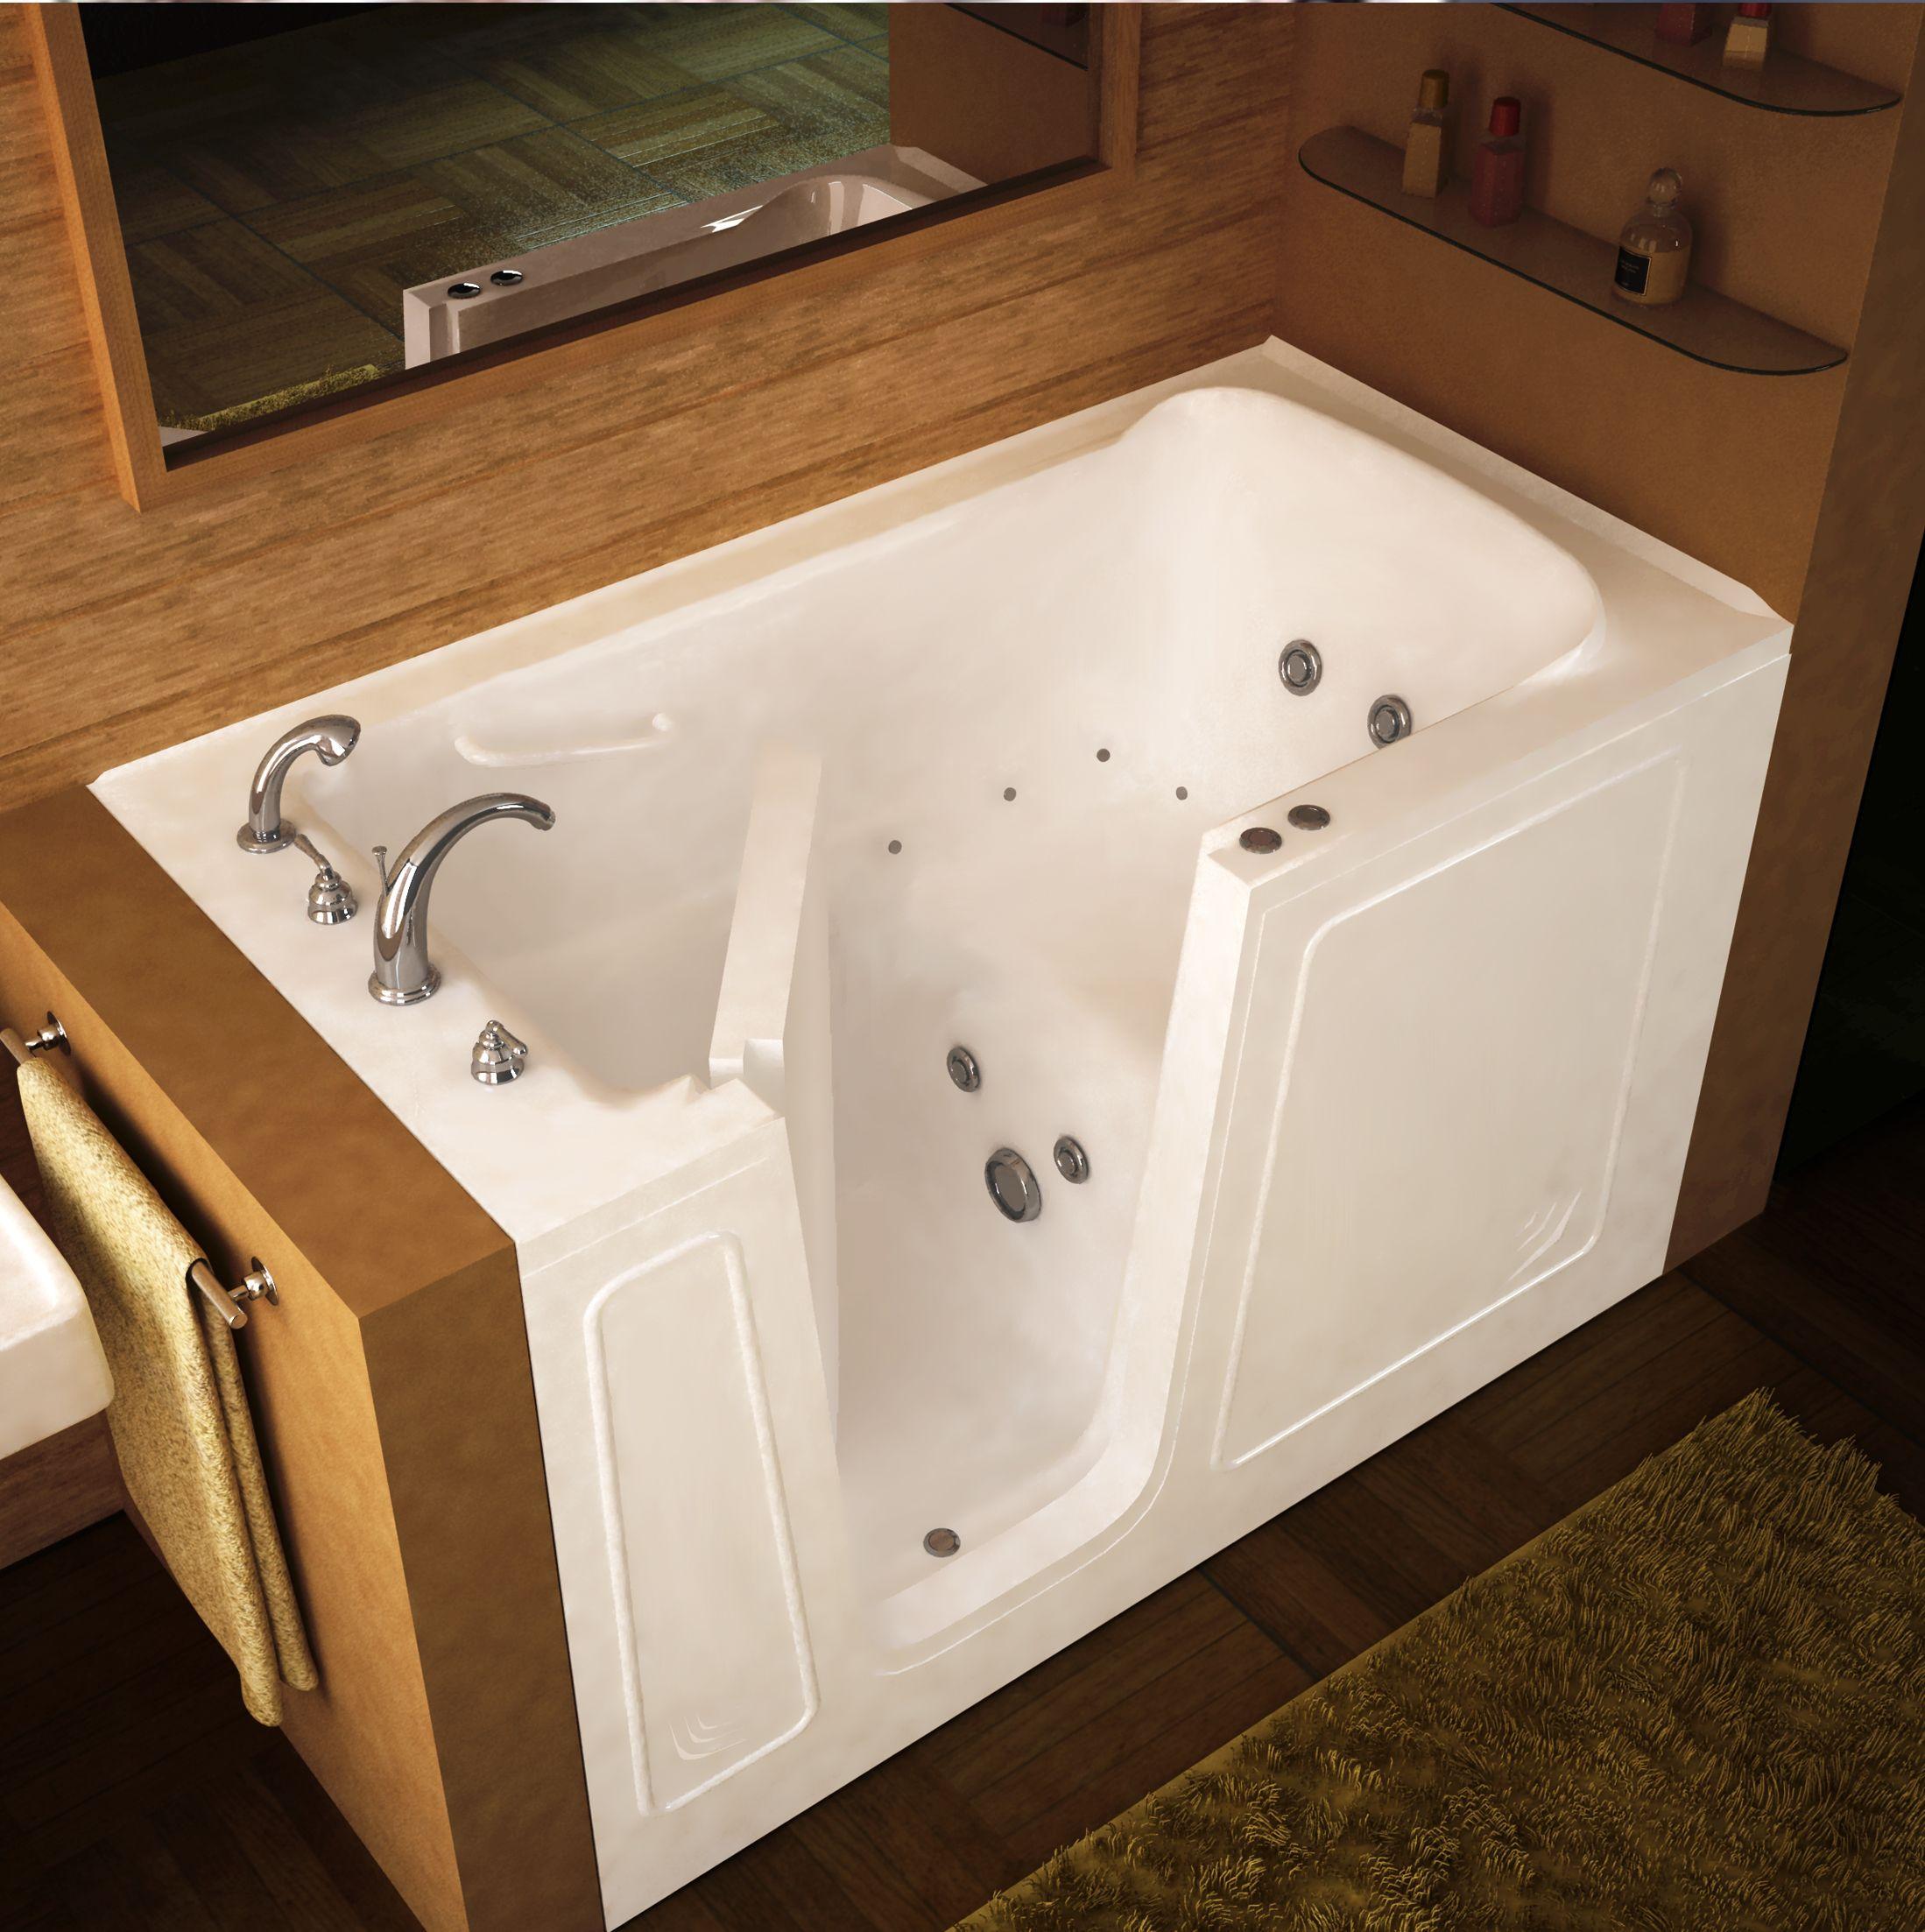 Elegant Best Deal Walk In Bathtubs Prices   Best Walk In Tubs Prices